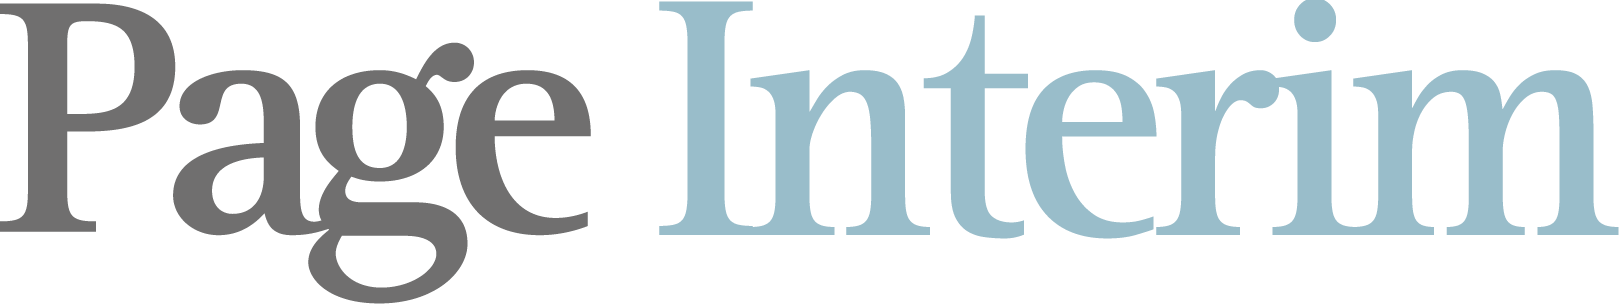 Page Interim Logotipo